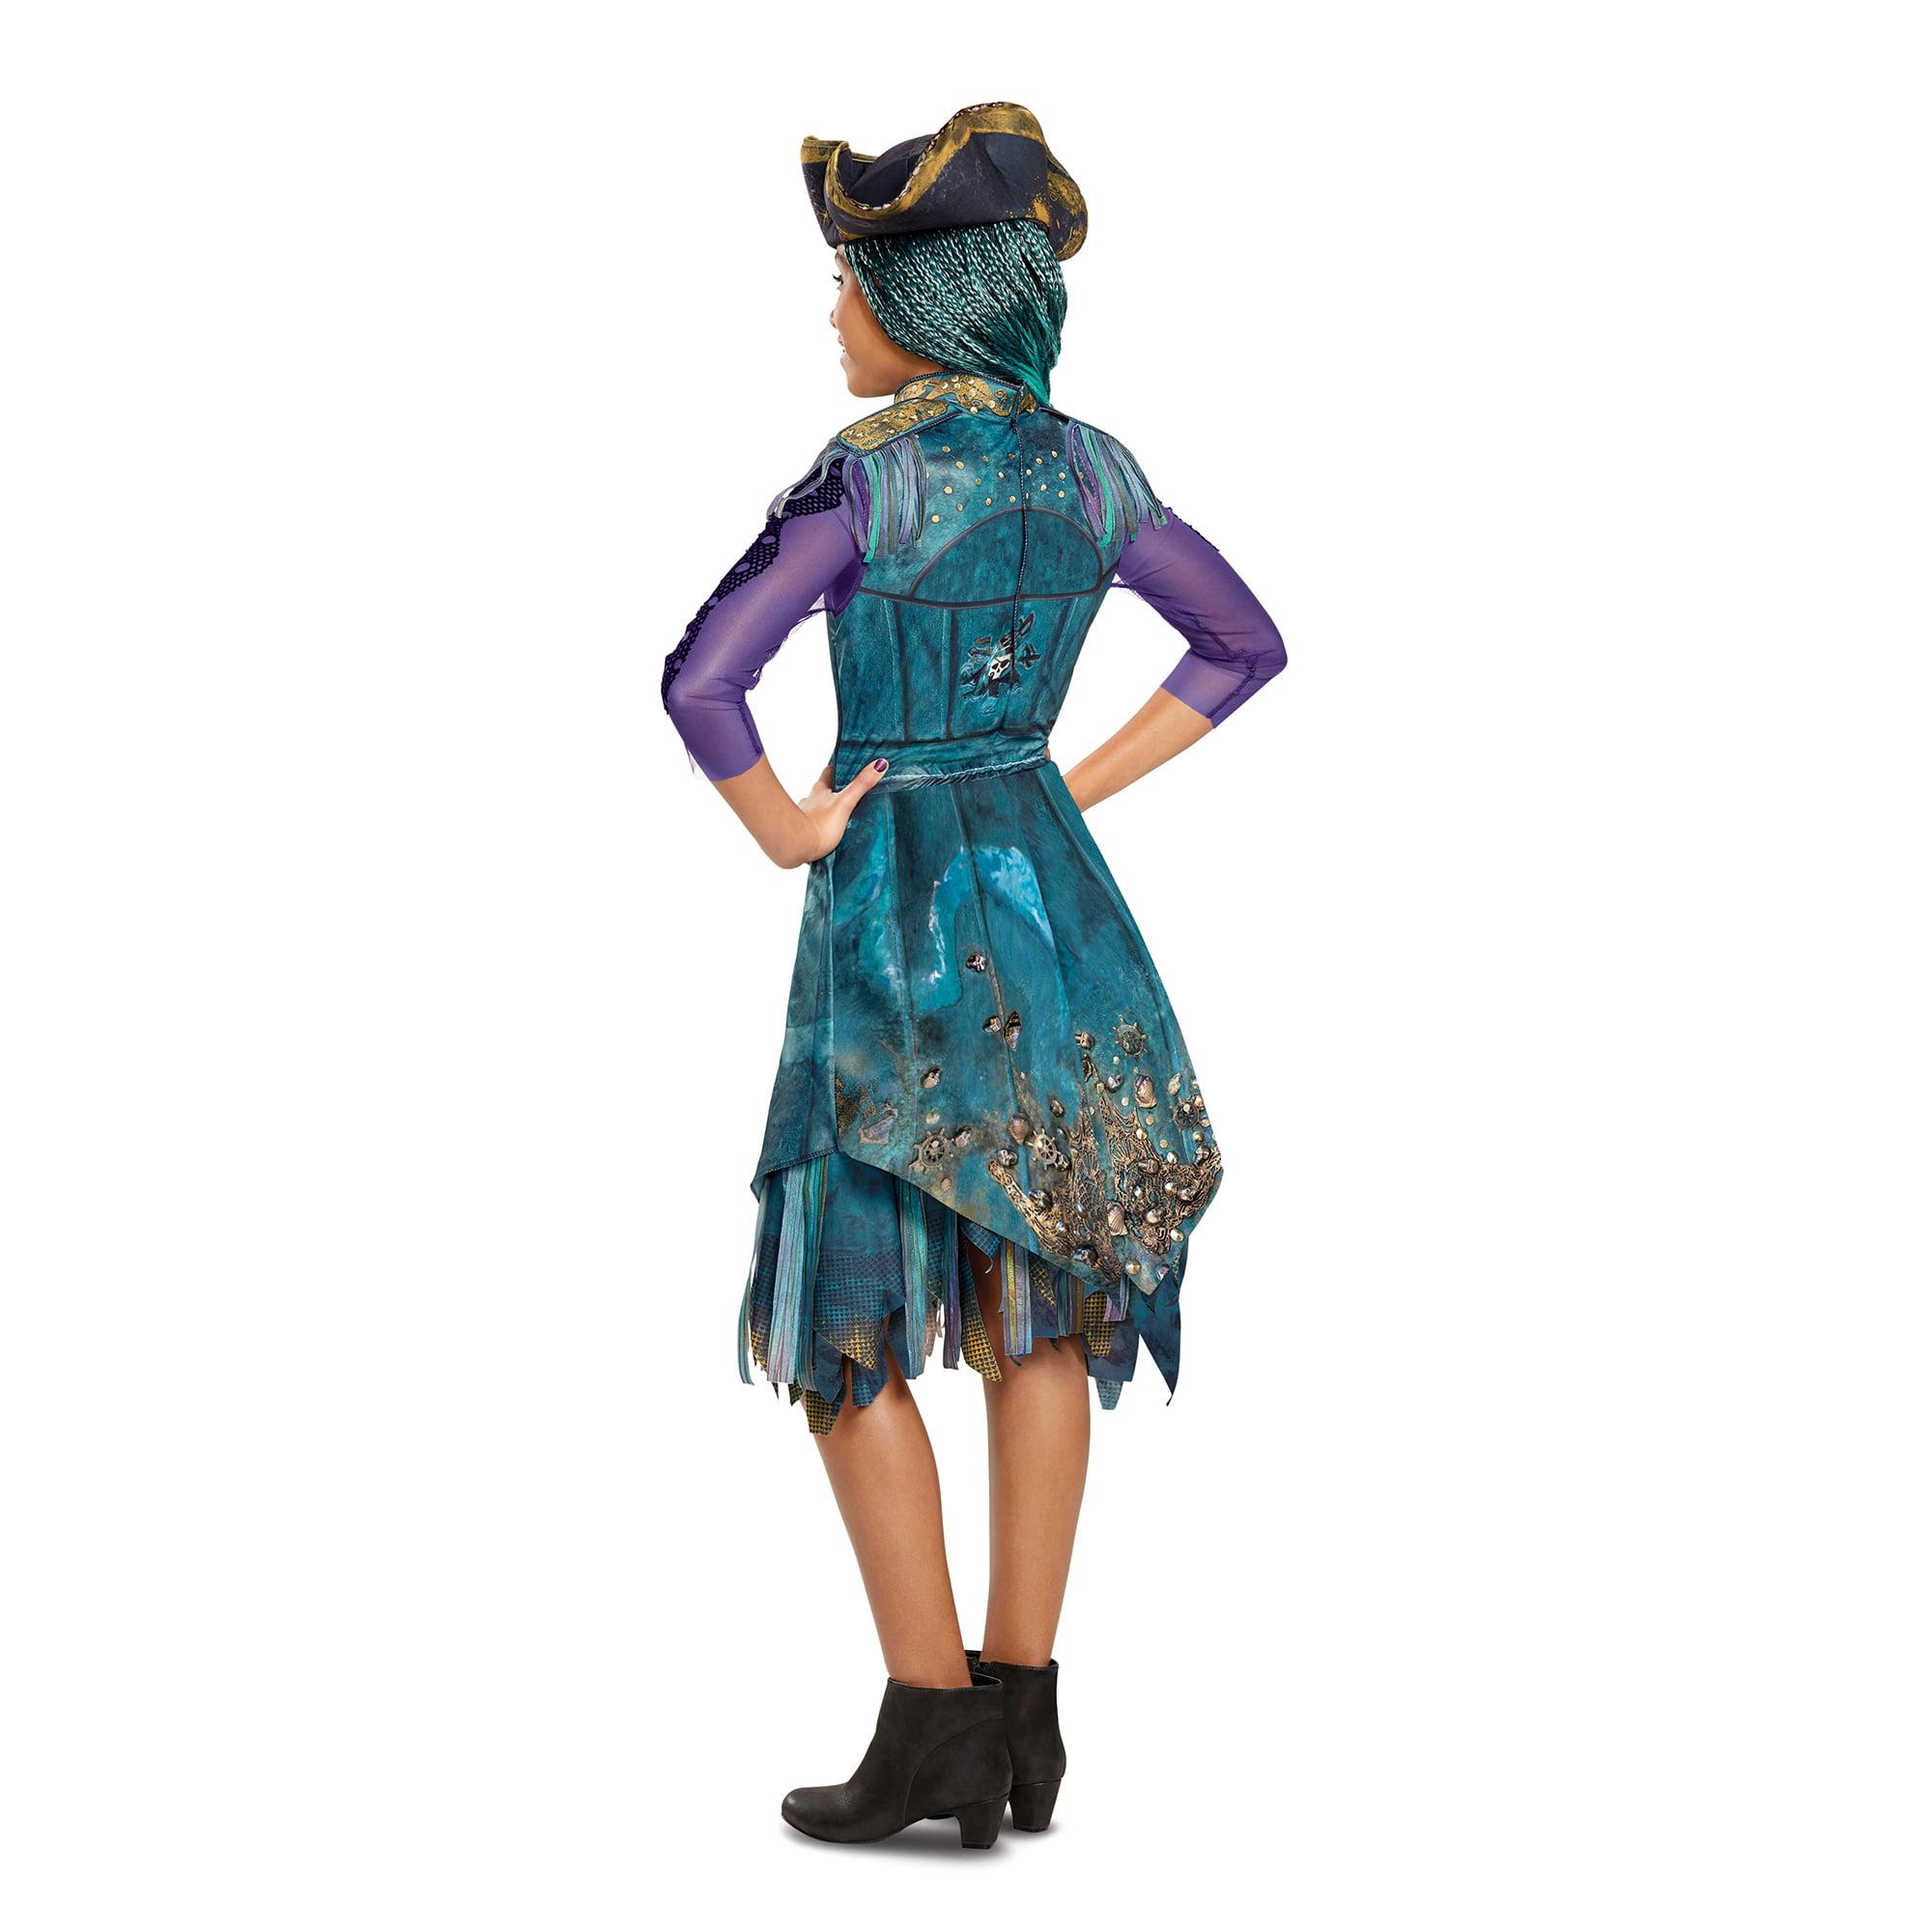 Disneyu0027s Descendants 2: Uma Classic Isle Look Child Costume   Walmart.com